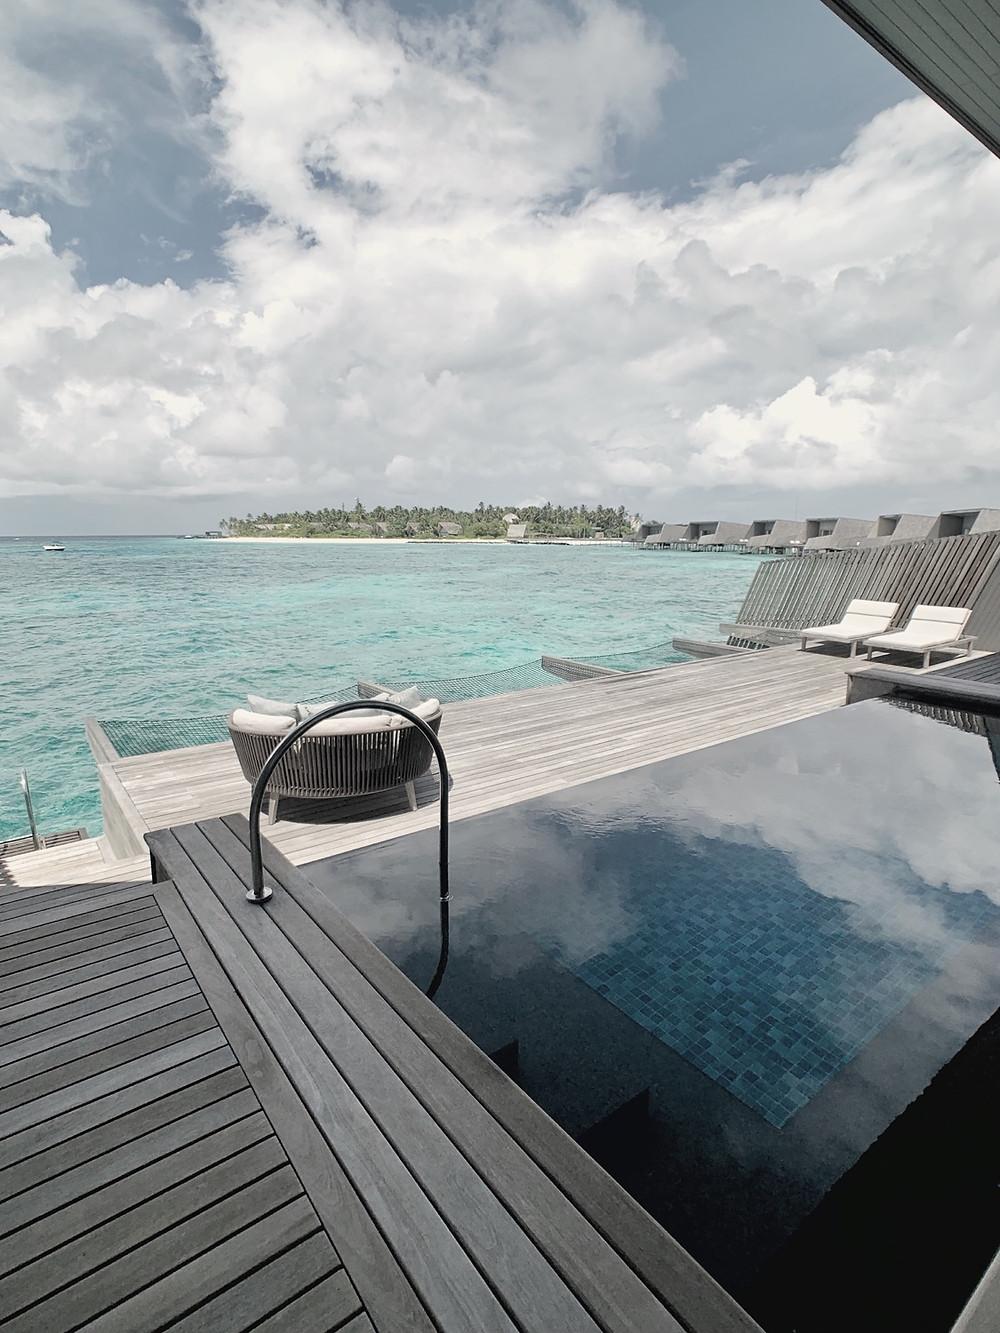 Maldives in May: St. Regis Overwater Villa